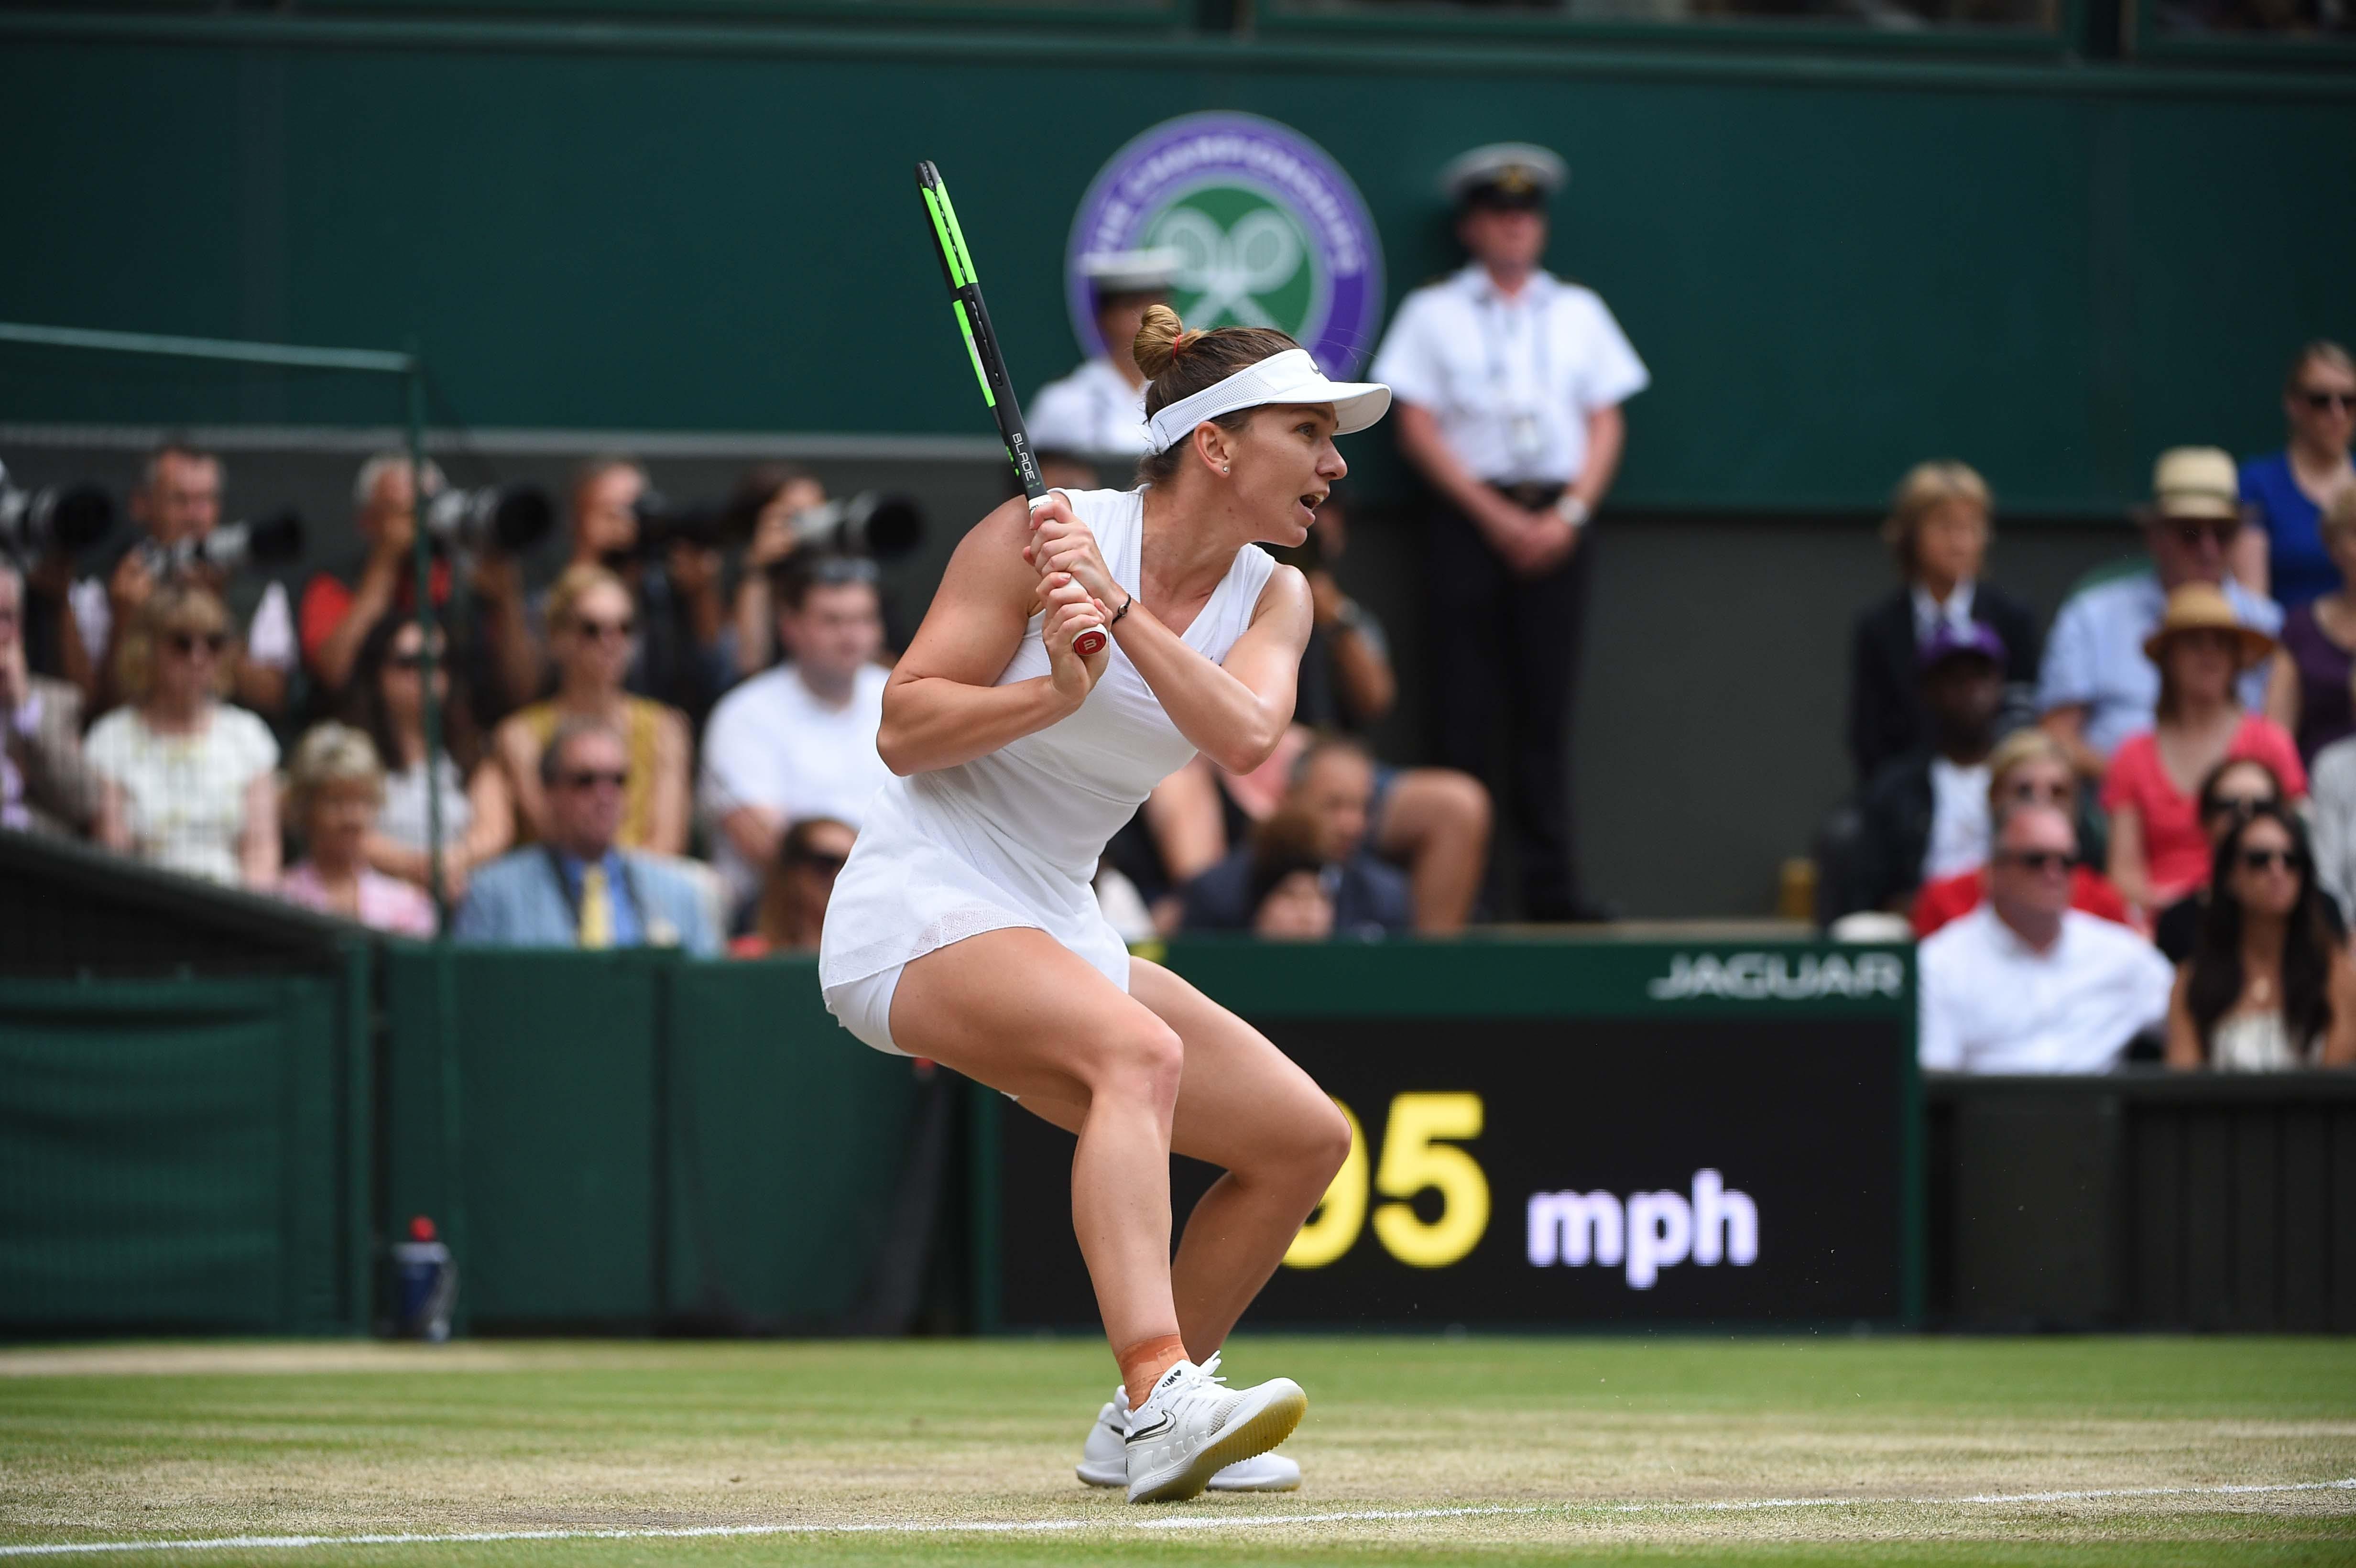 Simona Halep hitting a backhand during her Wimbledon 2019 final